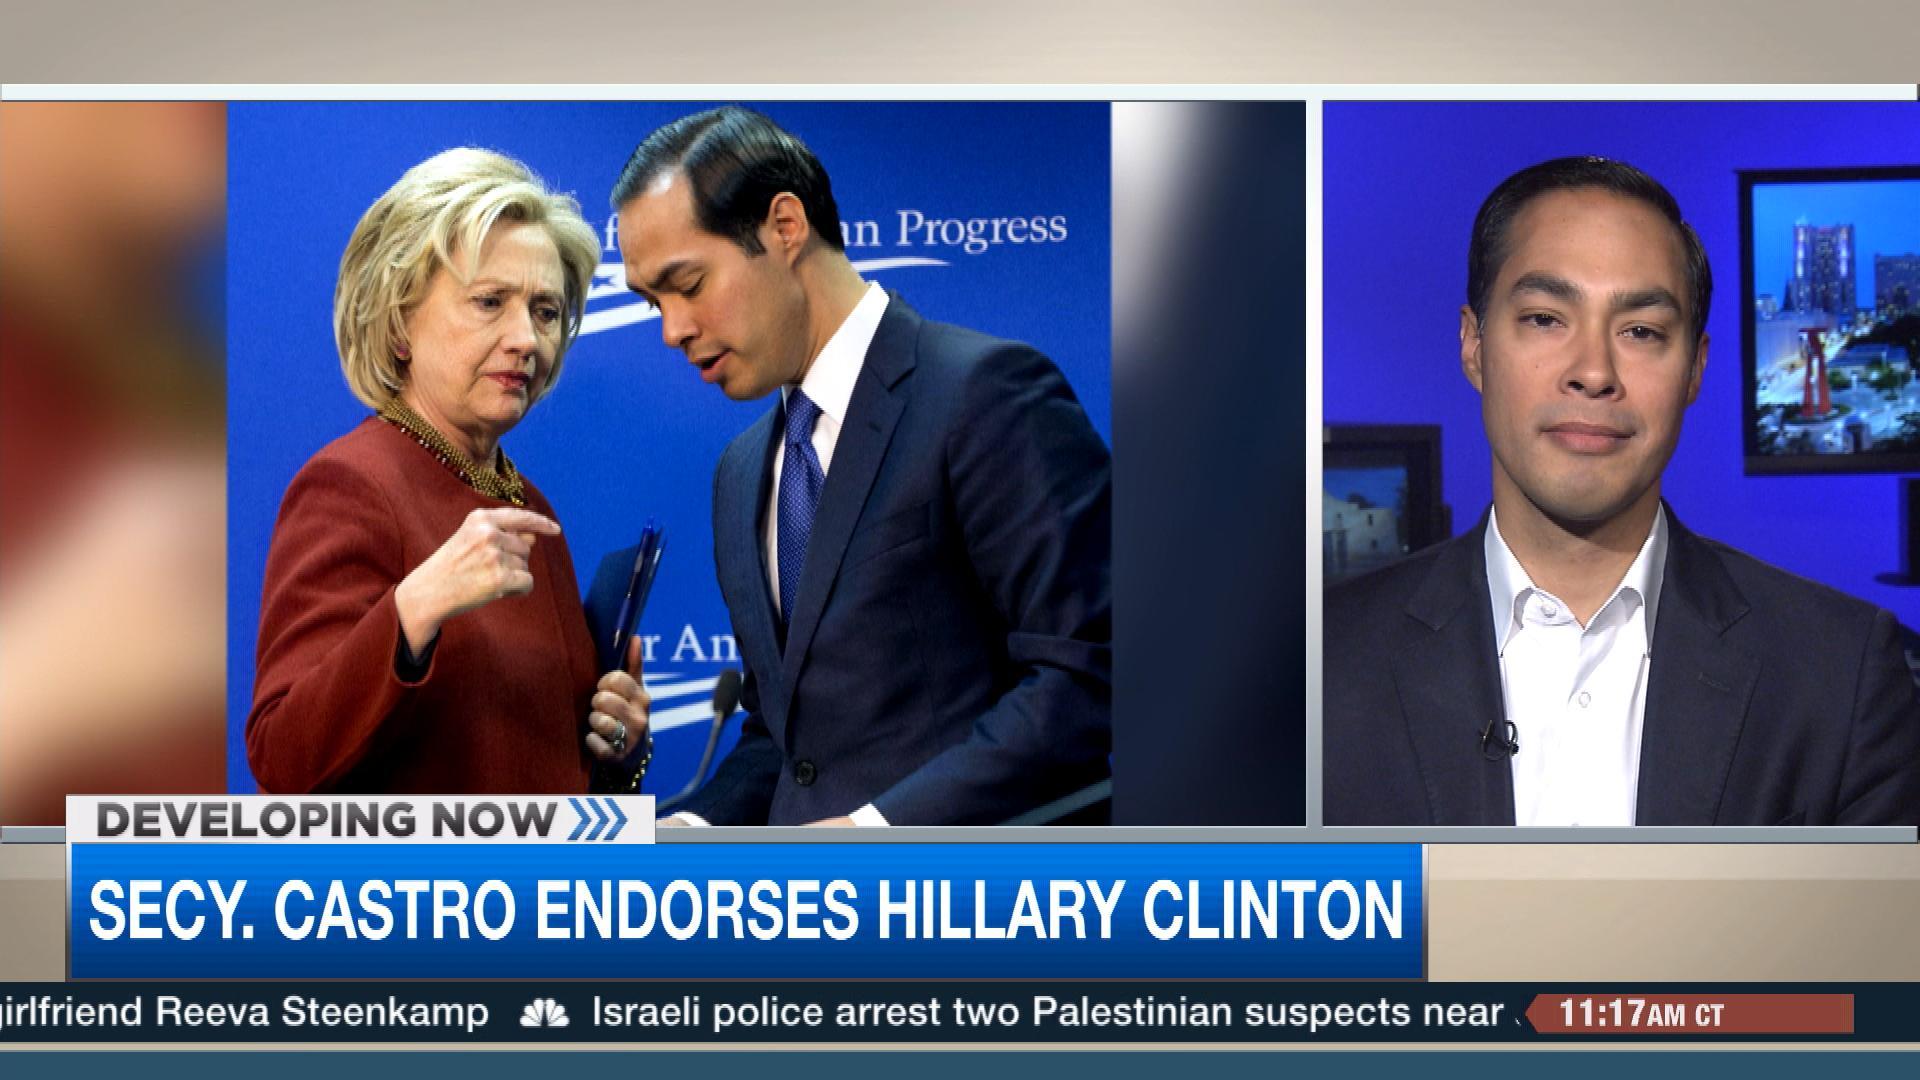 Secretary Castro endorses Hillary Clinton